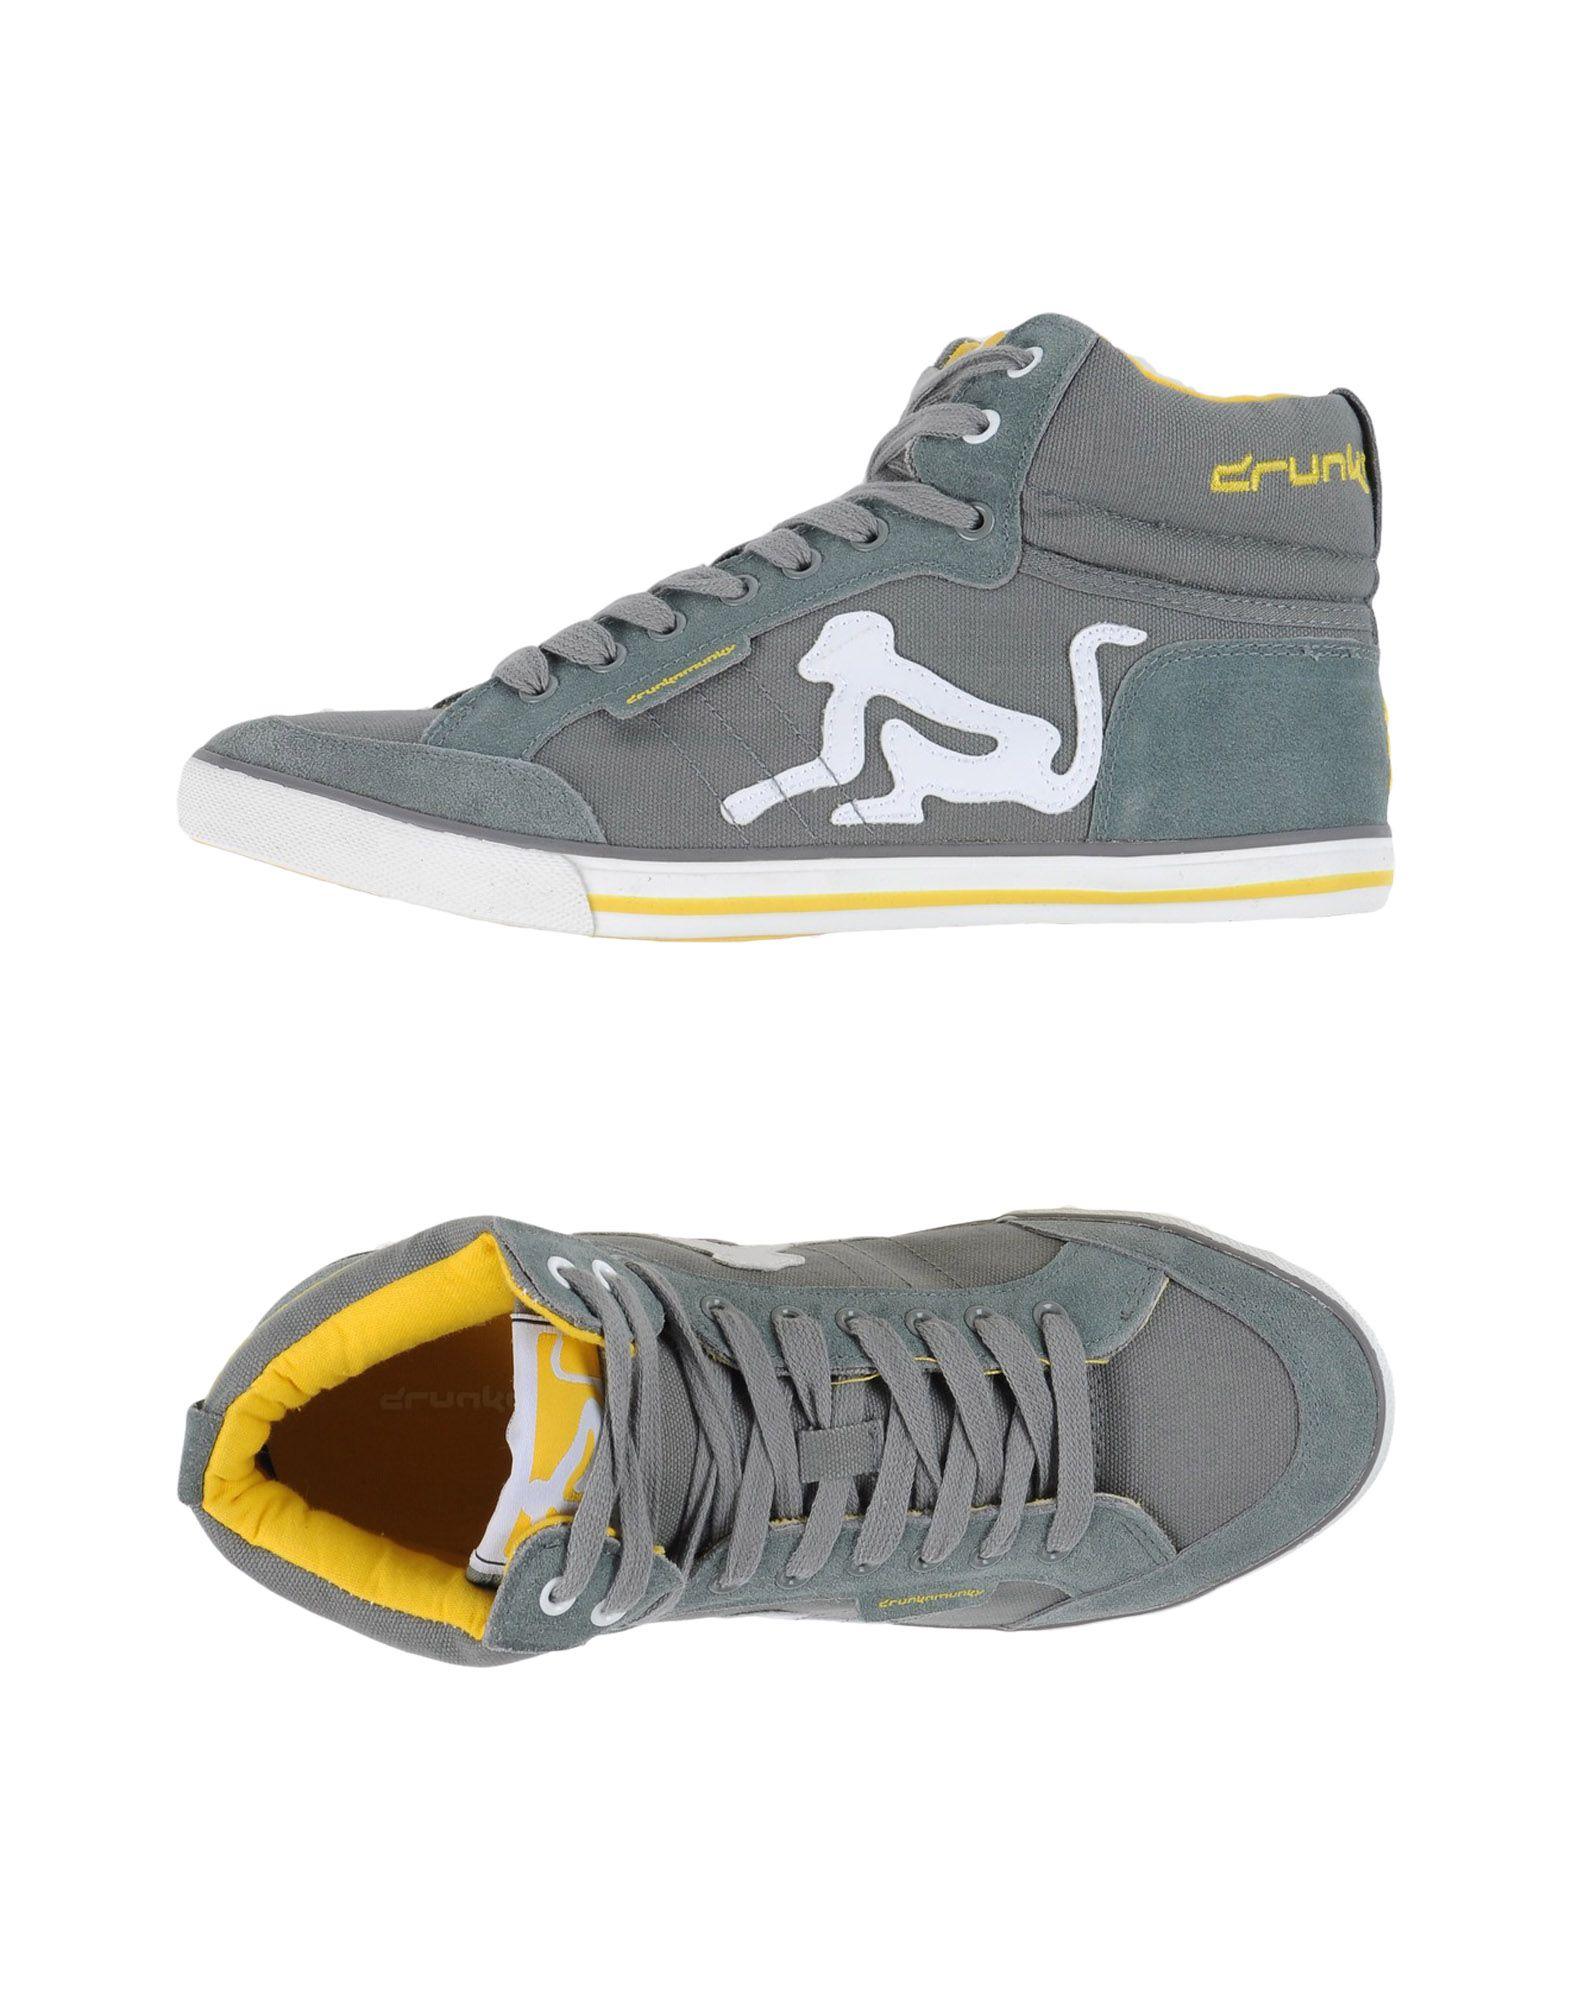 A buon mercato Sneakers Drunknmunky Uomo - 11344812TH